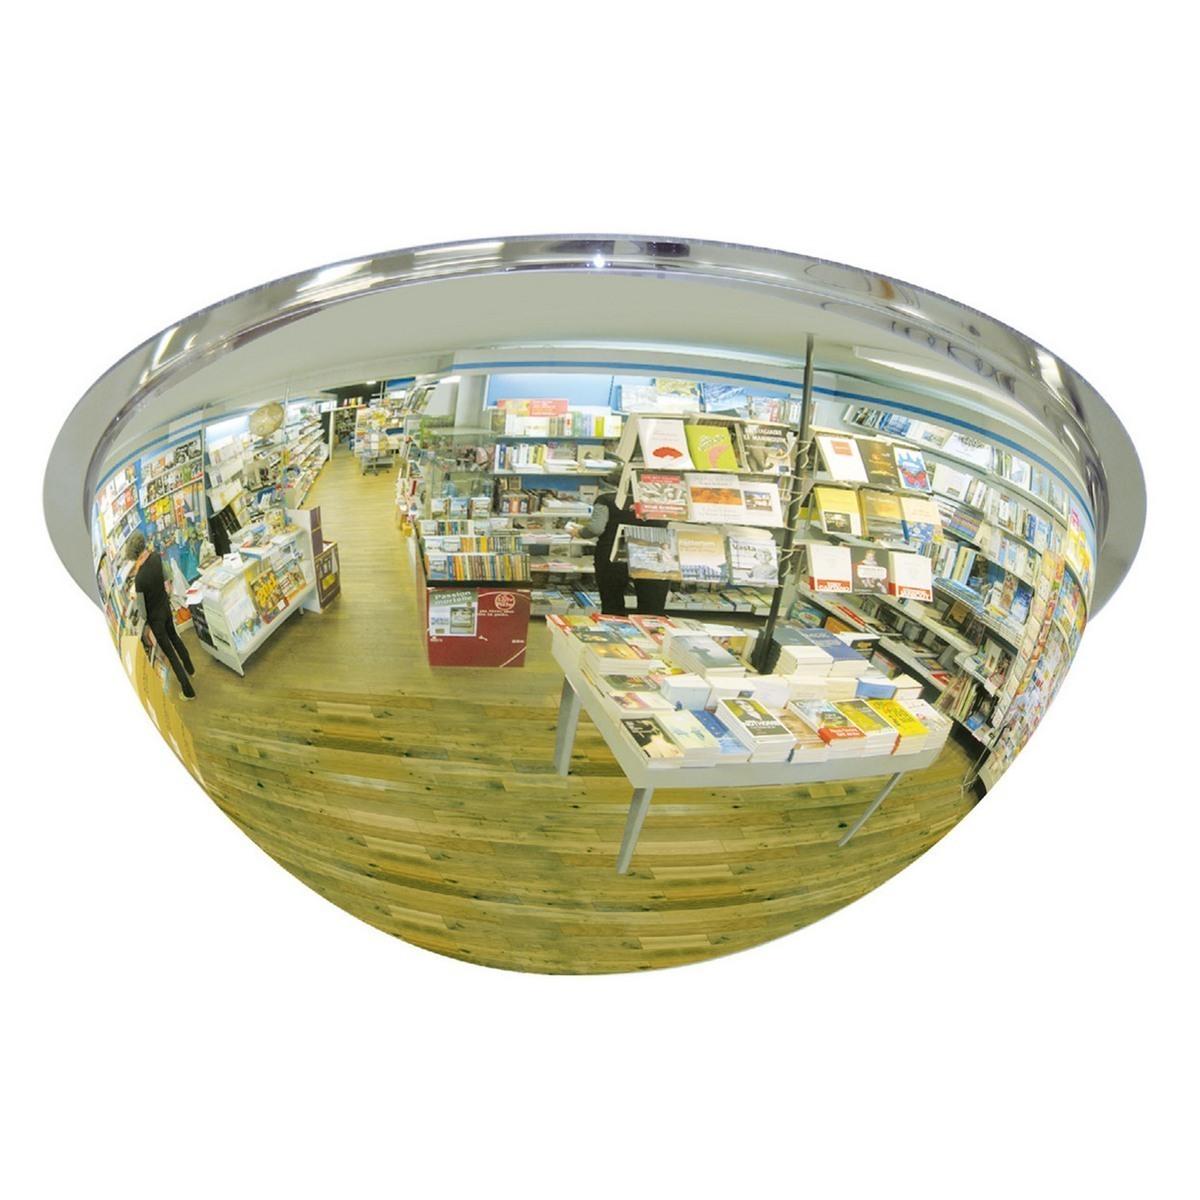 Industrial_hemispheric_surveillance_mirrors4